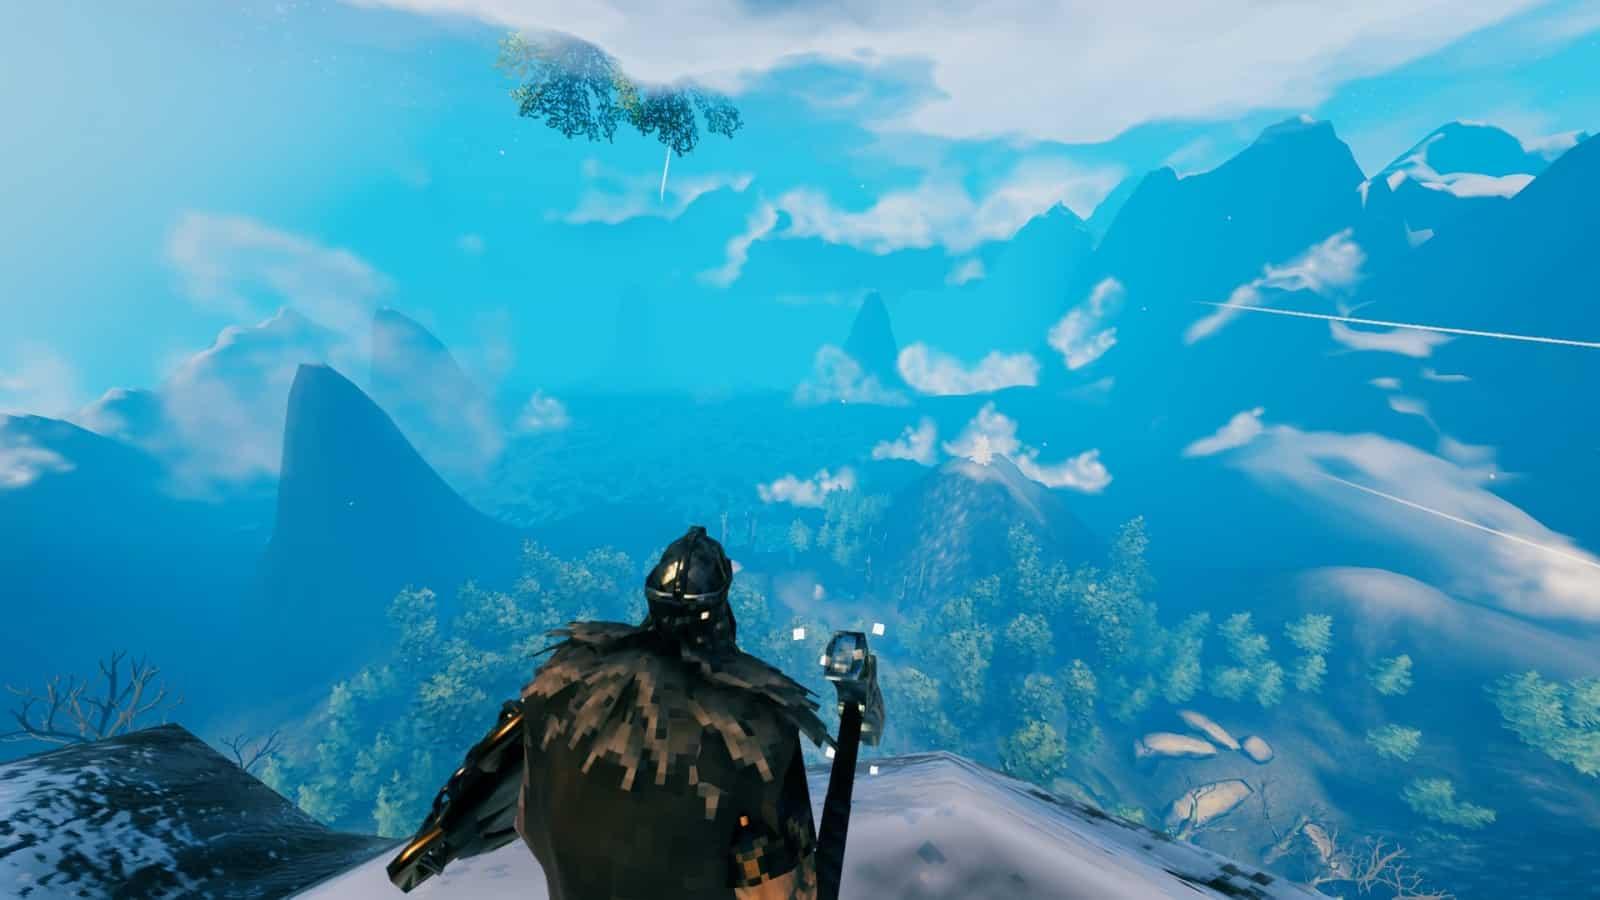 Northrend Recreated In Playable Valheim Mod 5